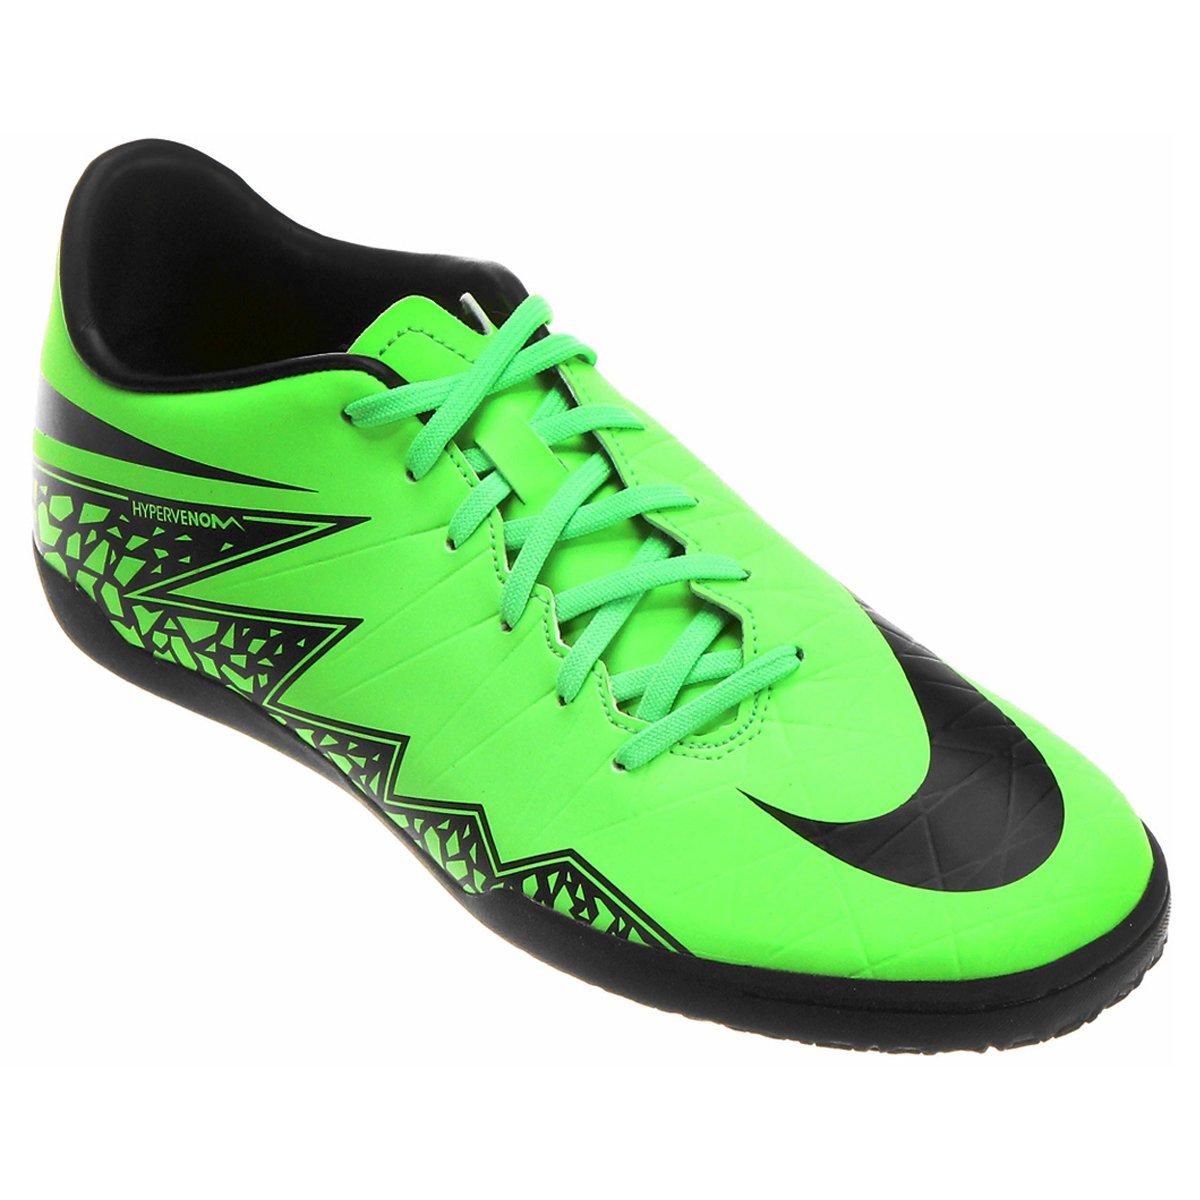 1d55d5df5c Chuteira Futsal Nike Hypervenom Phelon 2 IC Masculina